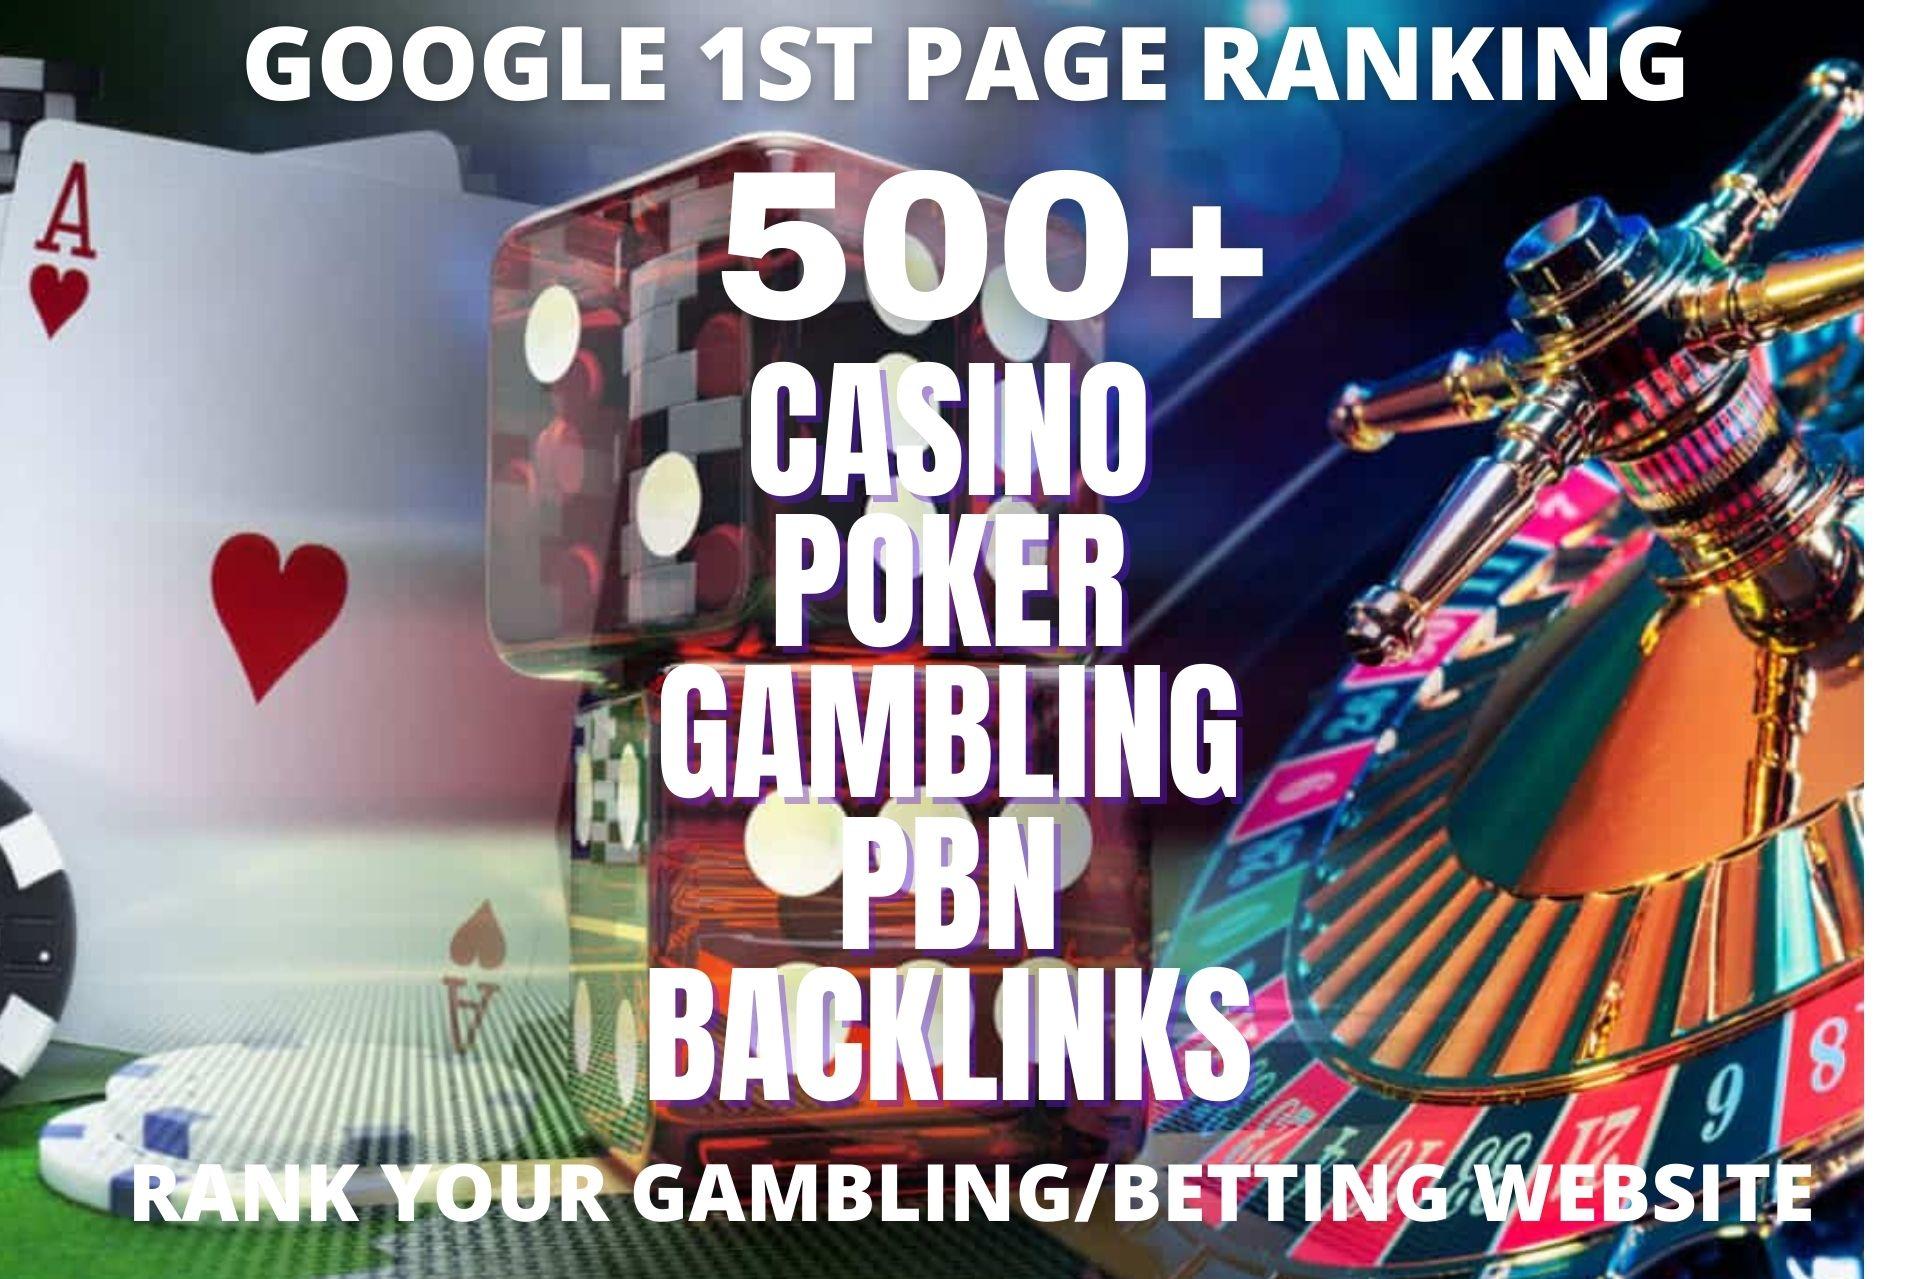 Permanent 500 powerful Casino,  Gambling,  Poker,  Sports High Quality Web2.0 unique Backlinks